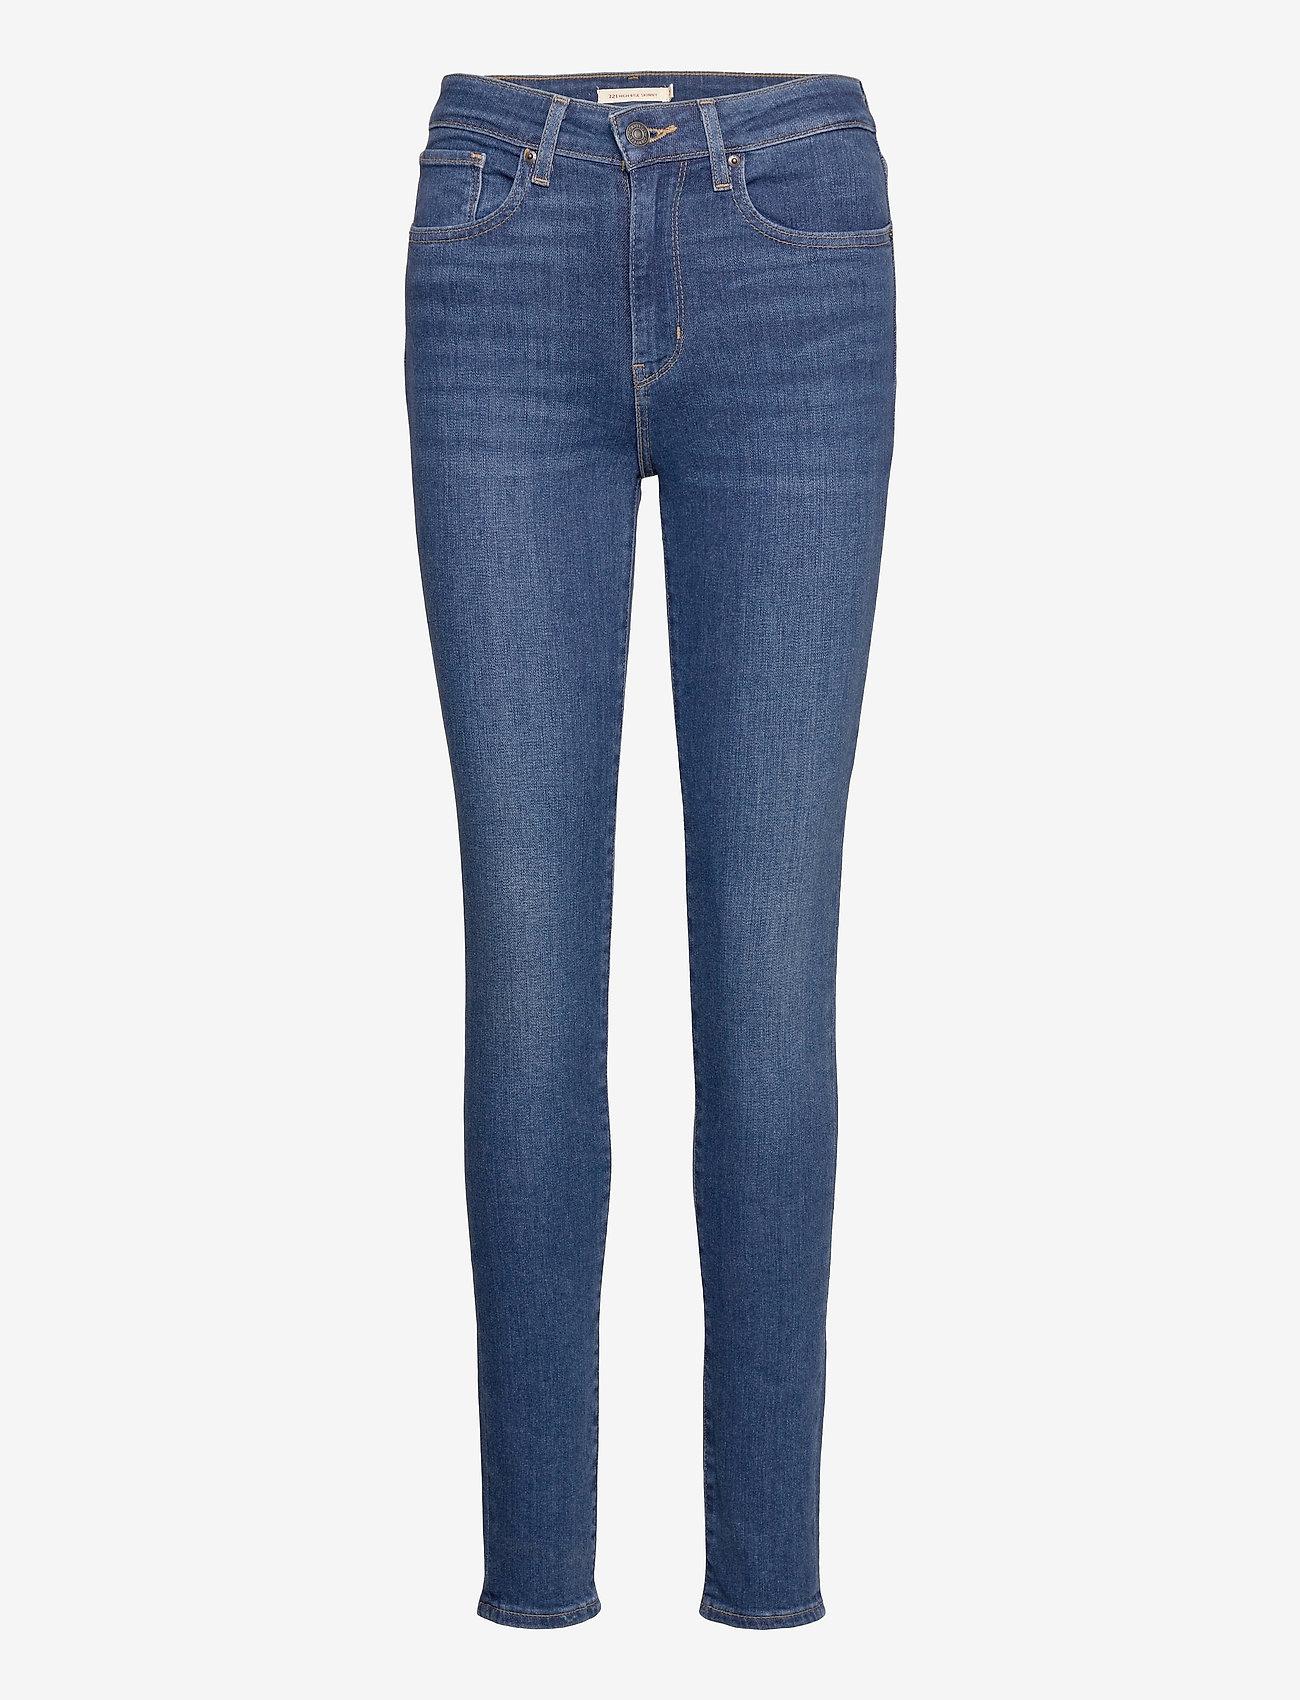 LEVI´S Women - 721 HIGH RISE SKINNY GOOD EVEN - skinny jeans - dark indigo - worn in - 0